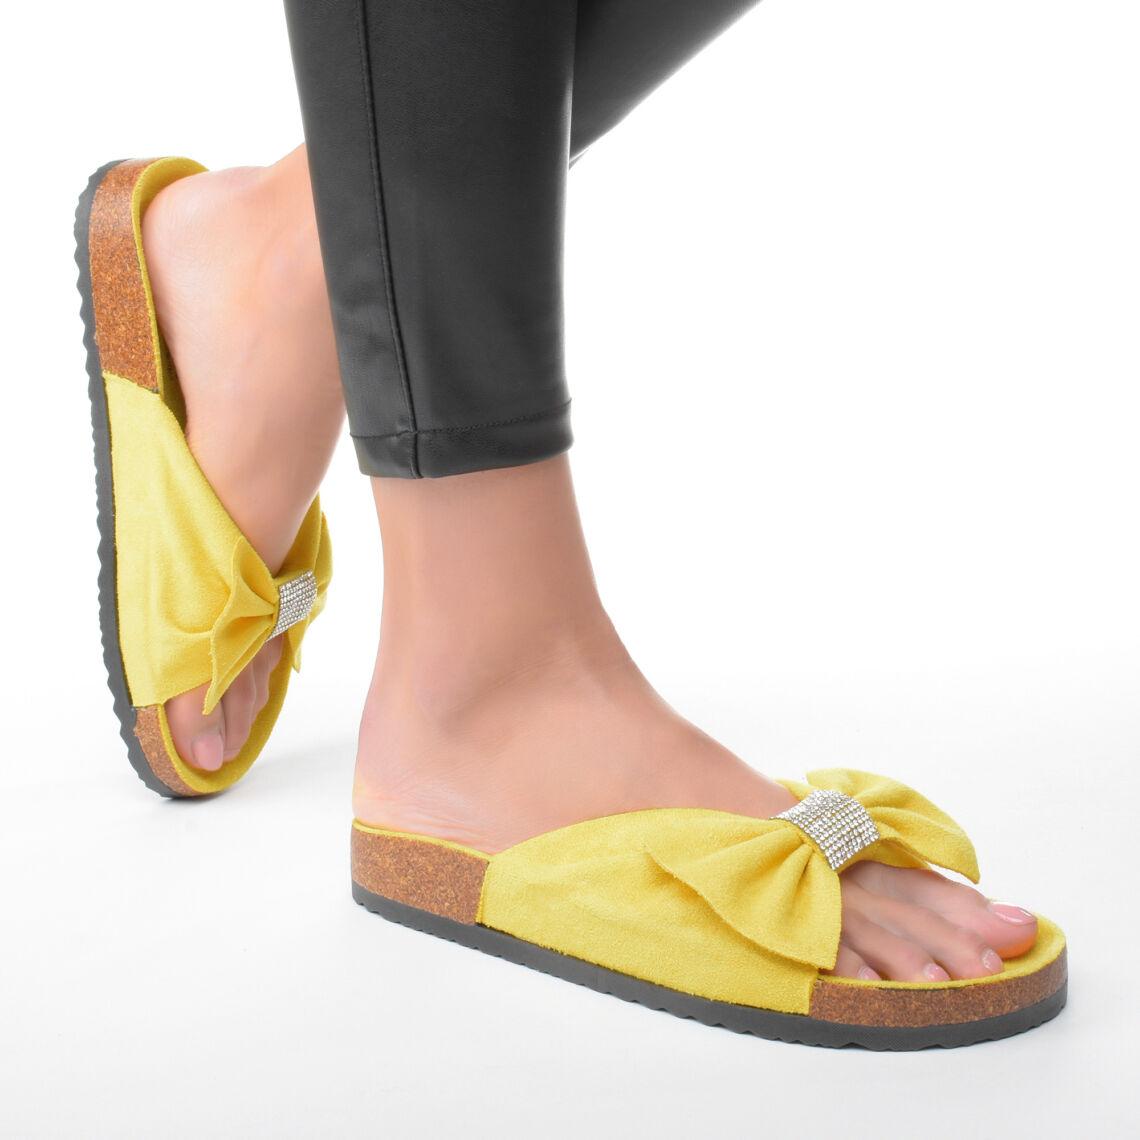 5b99eb5d5f Sárga Masnis Női Művelúr Papucs - NŐI PAPUCS - Női cipő webáruház ...